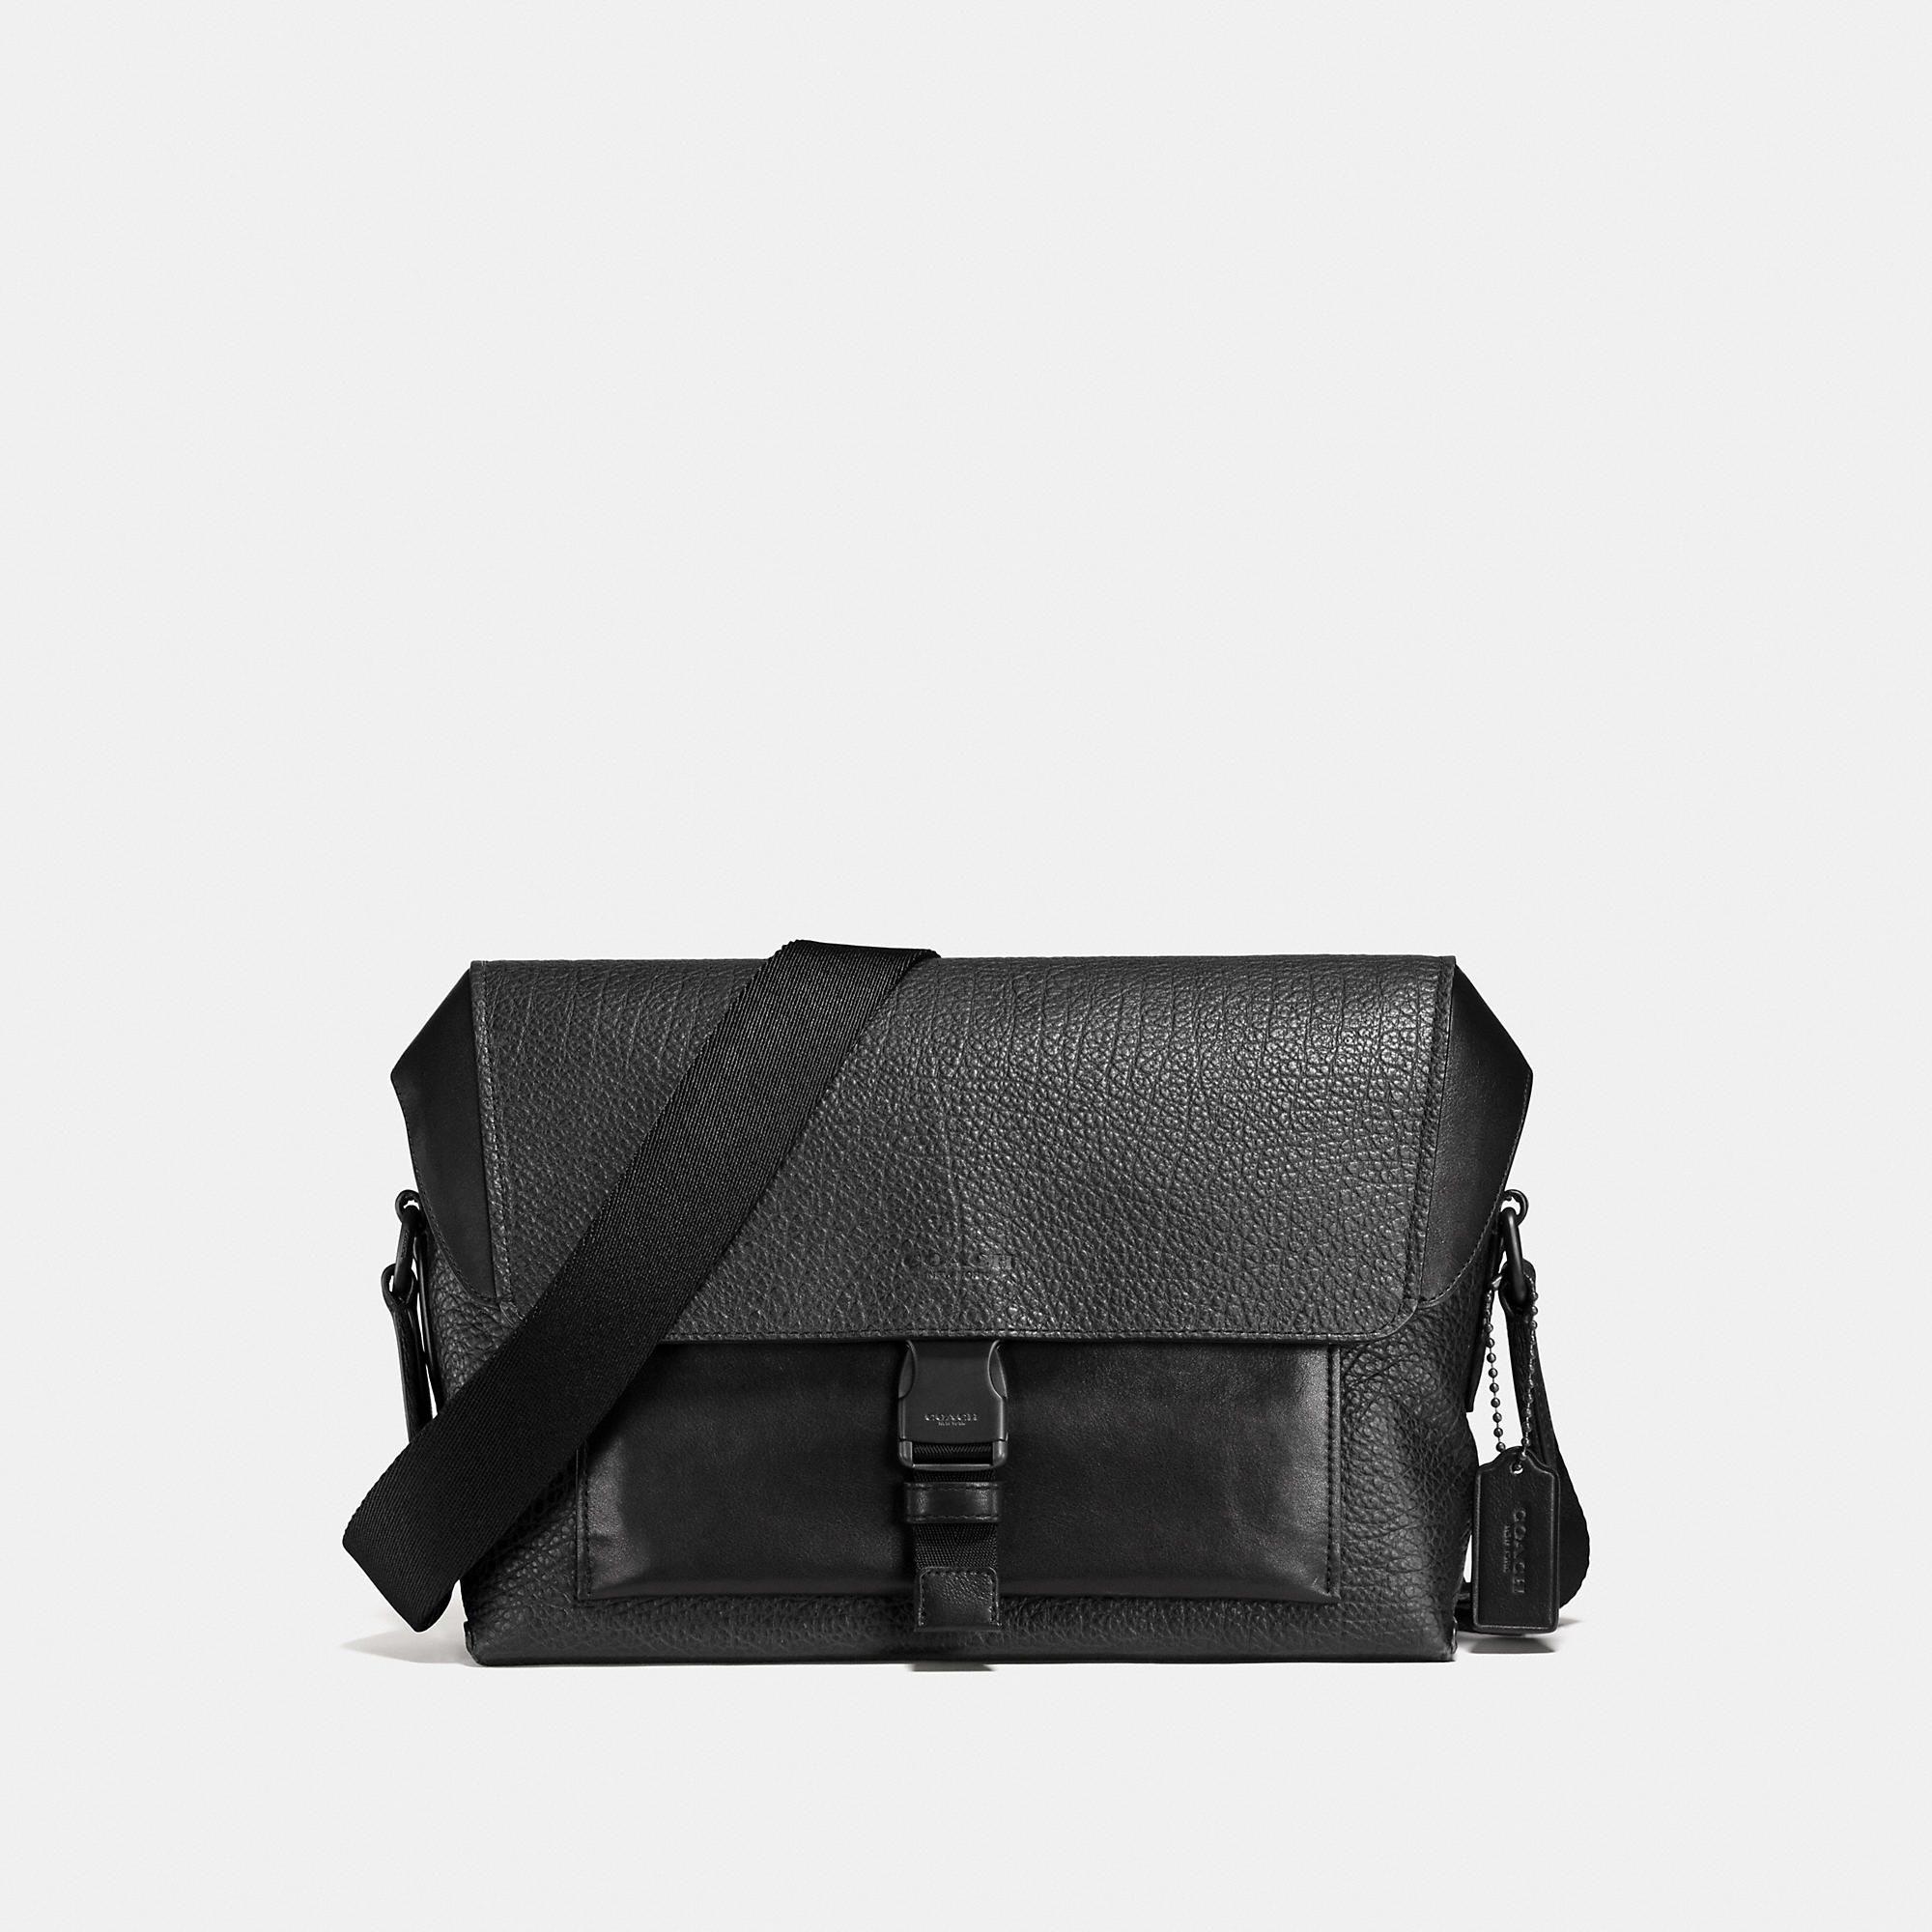 Coach Manhattan Bike Bag In Mixed Leather